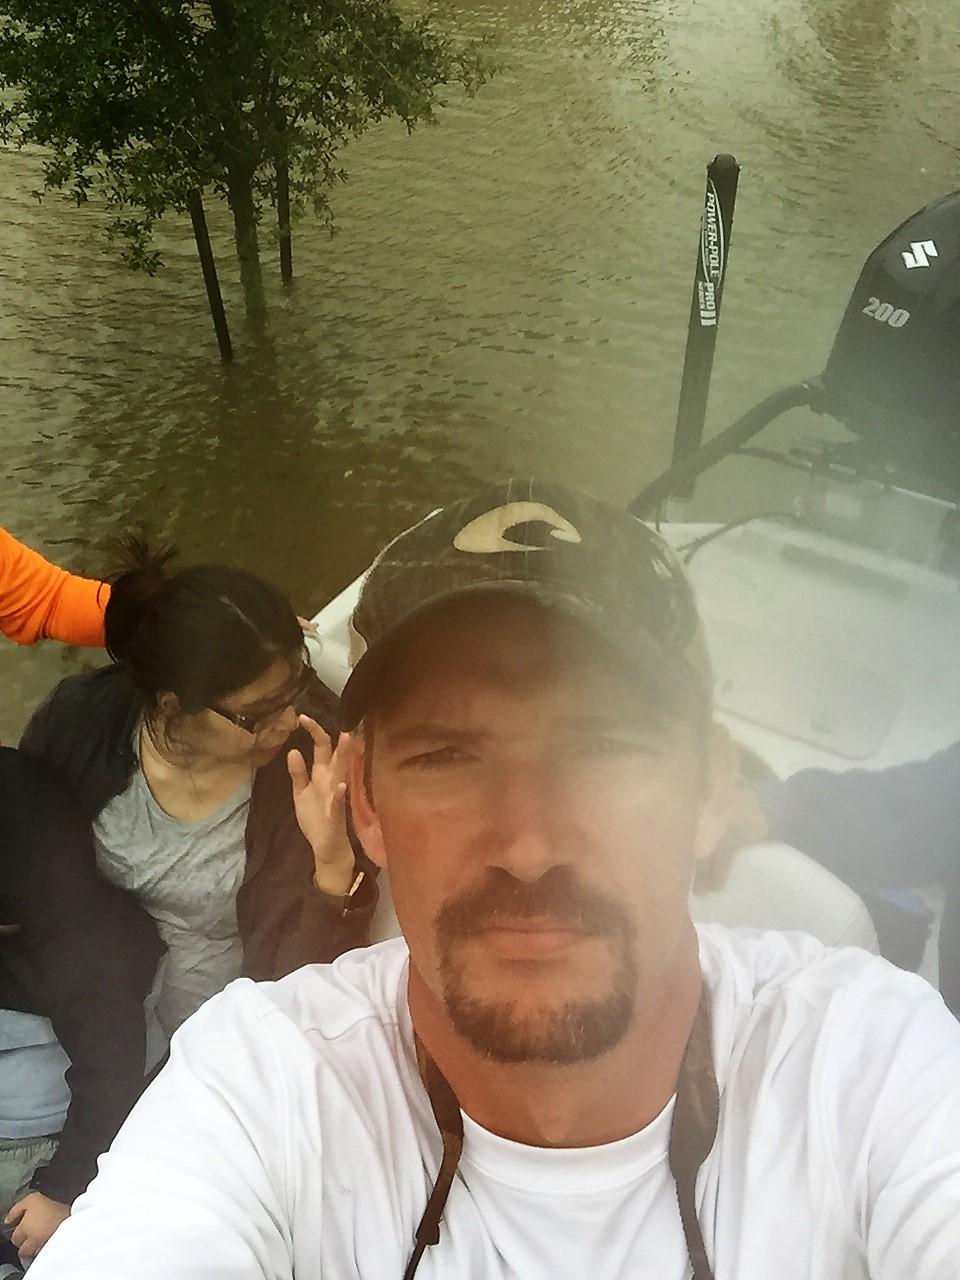 Hurrican arvey Help